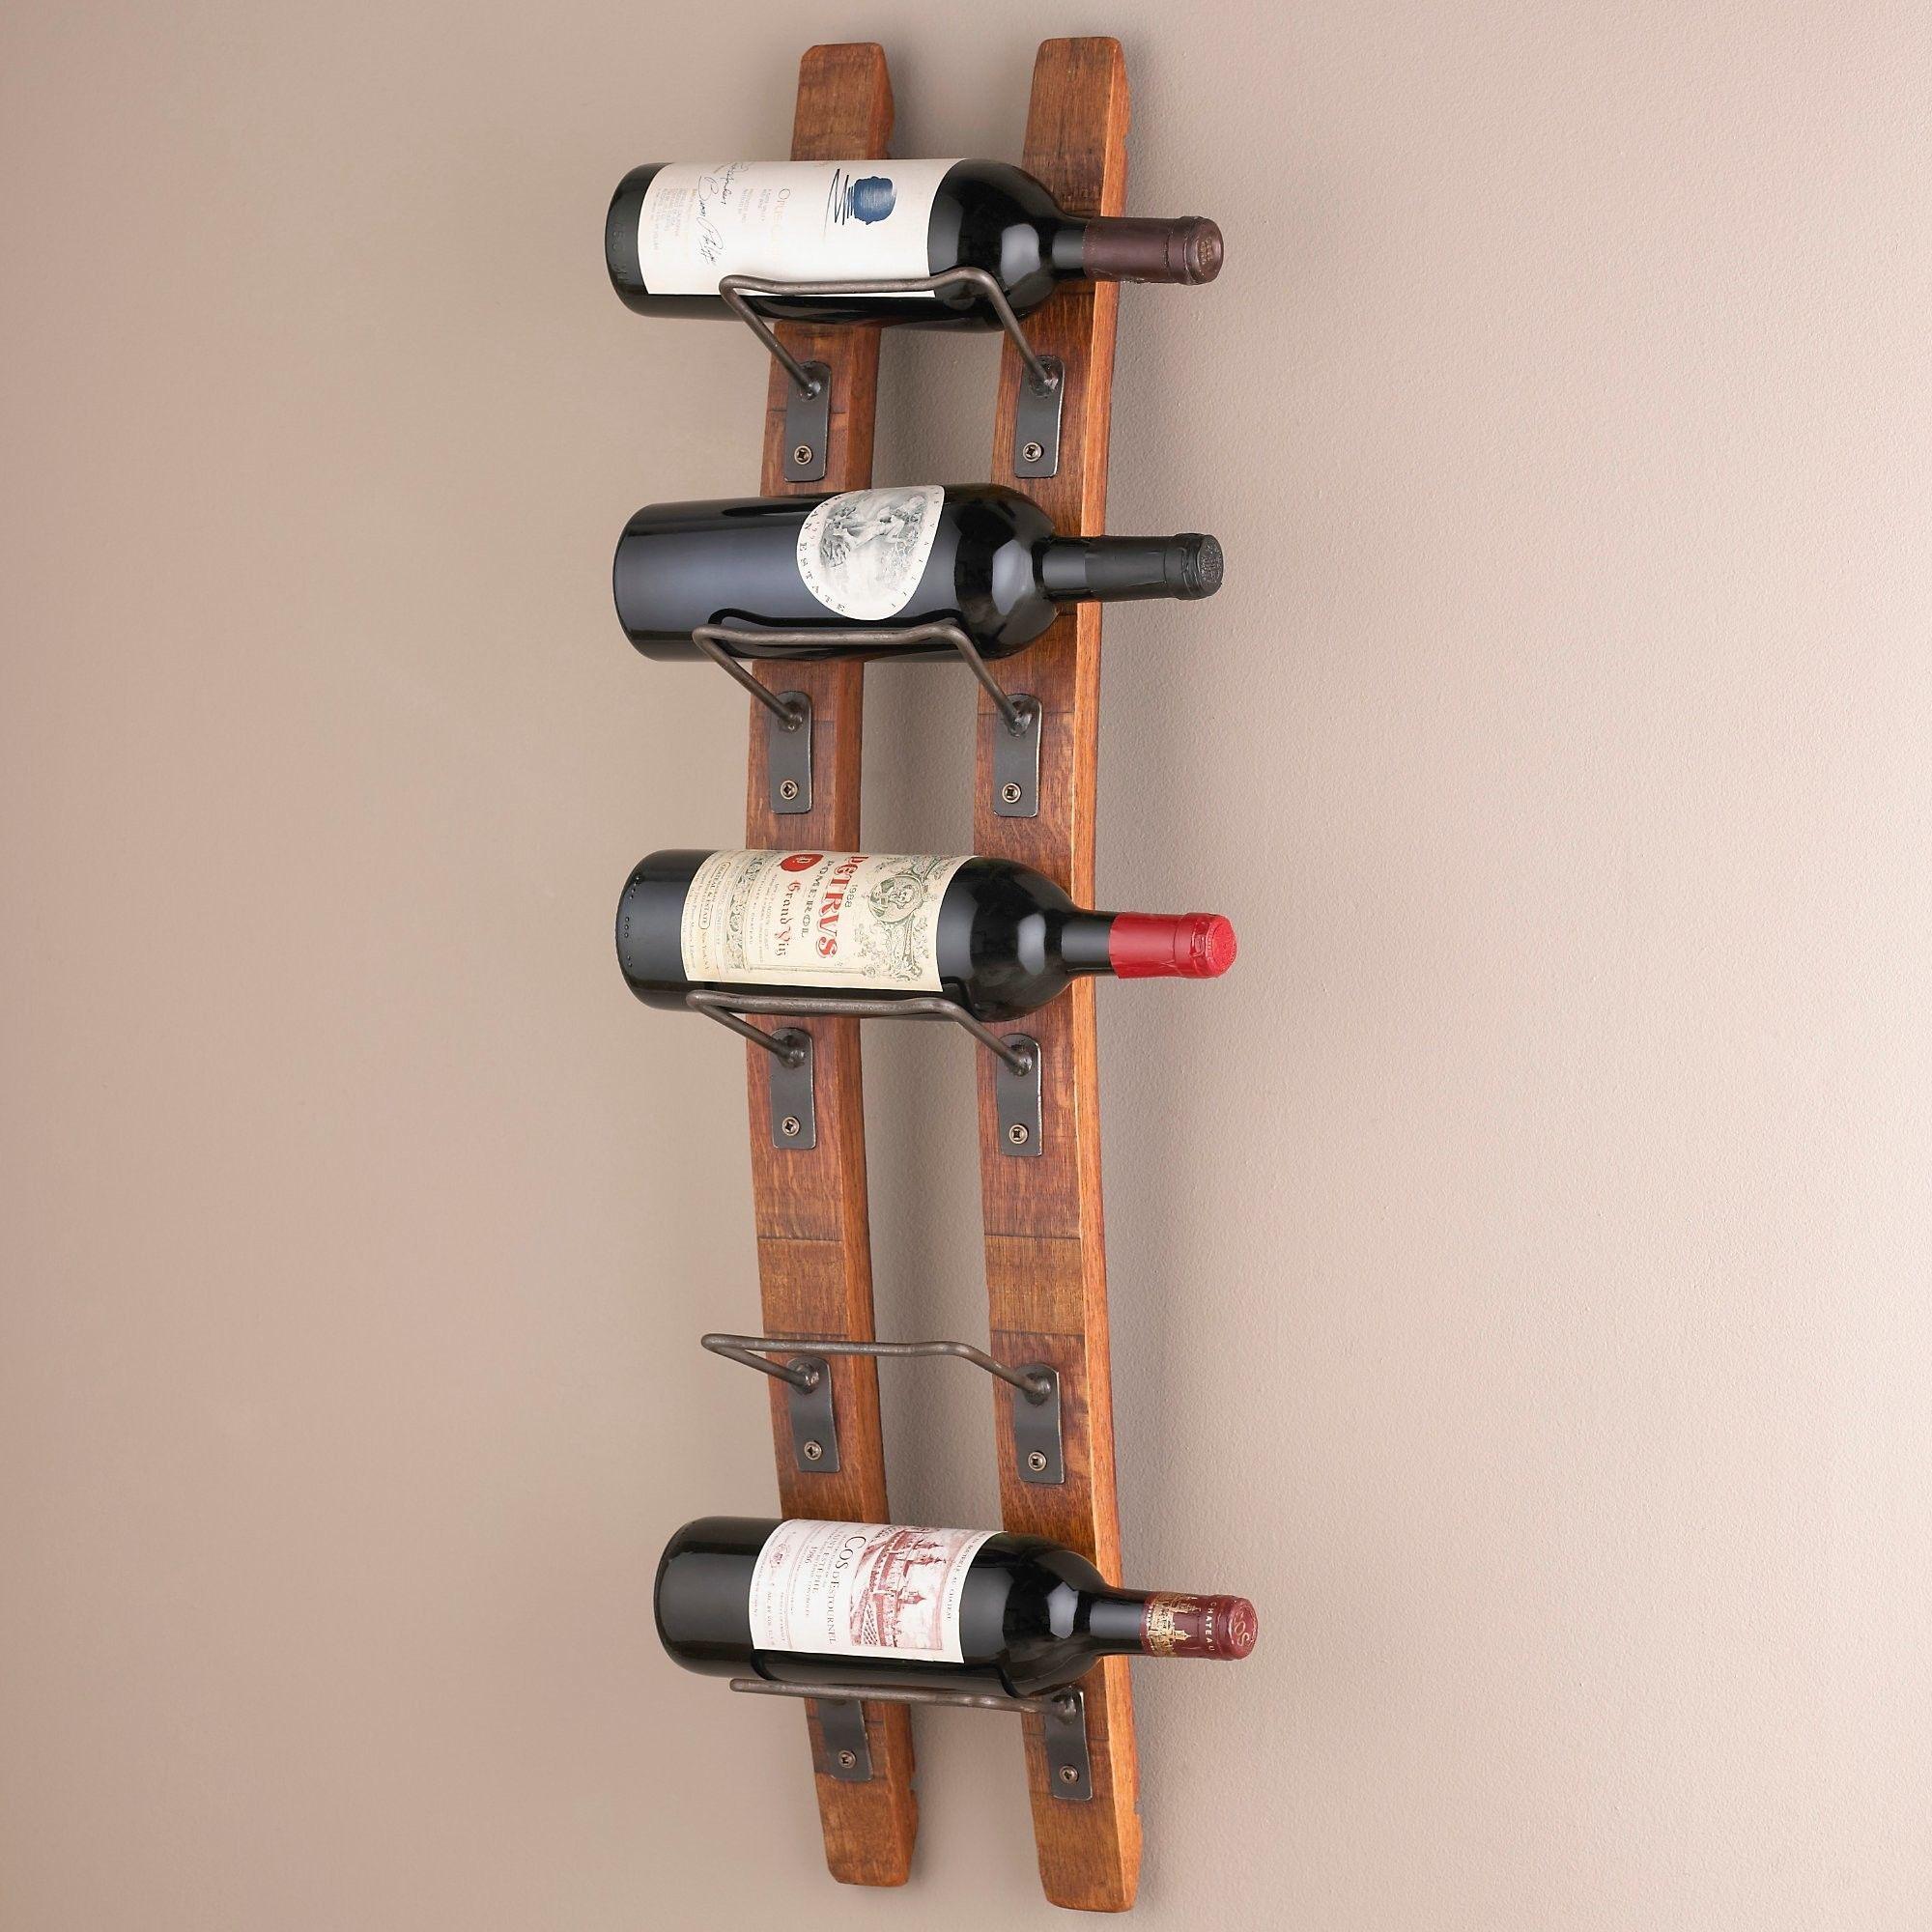 bottle estancia icn home trading wine l p ae wildon rack wall mount